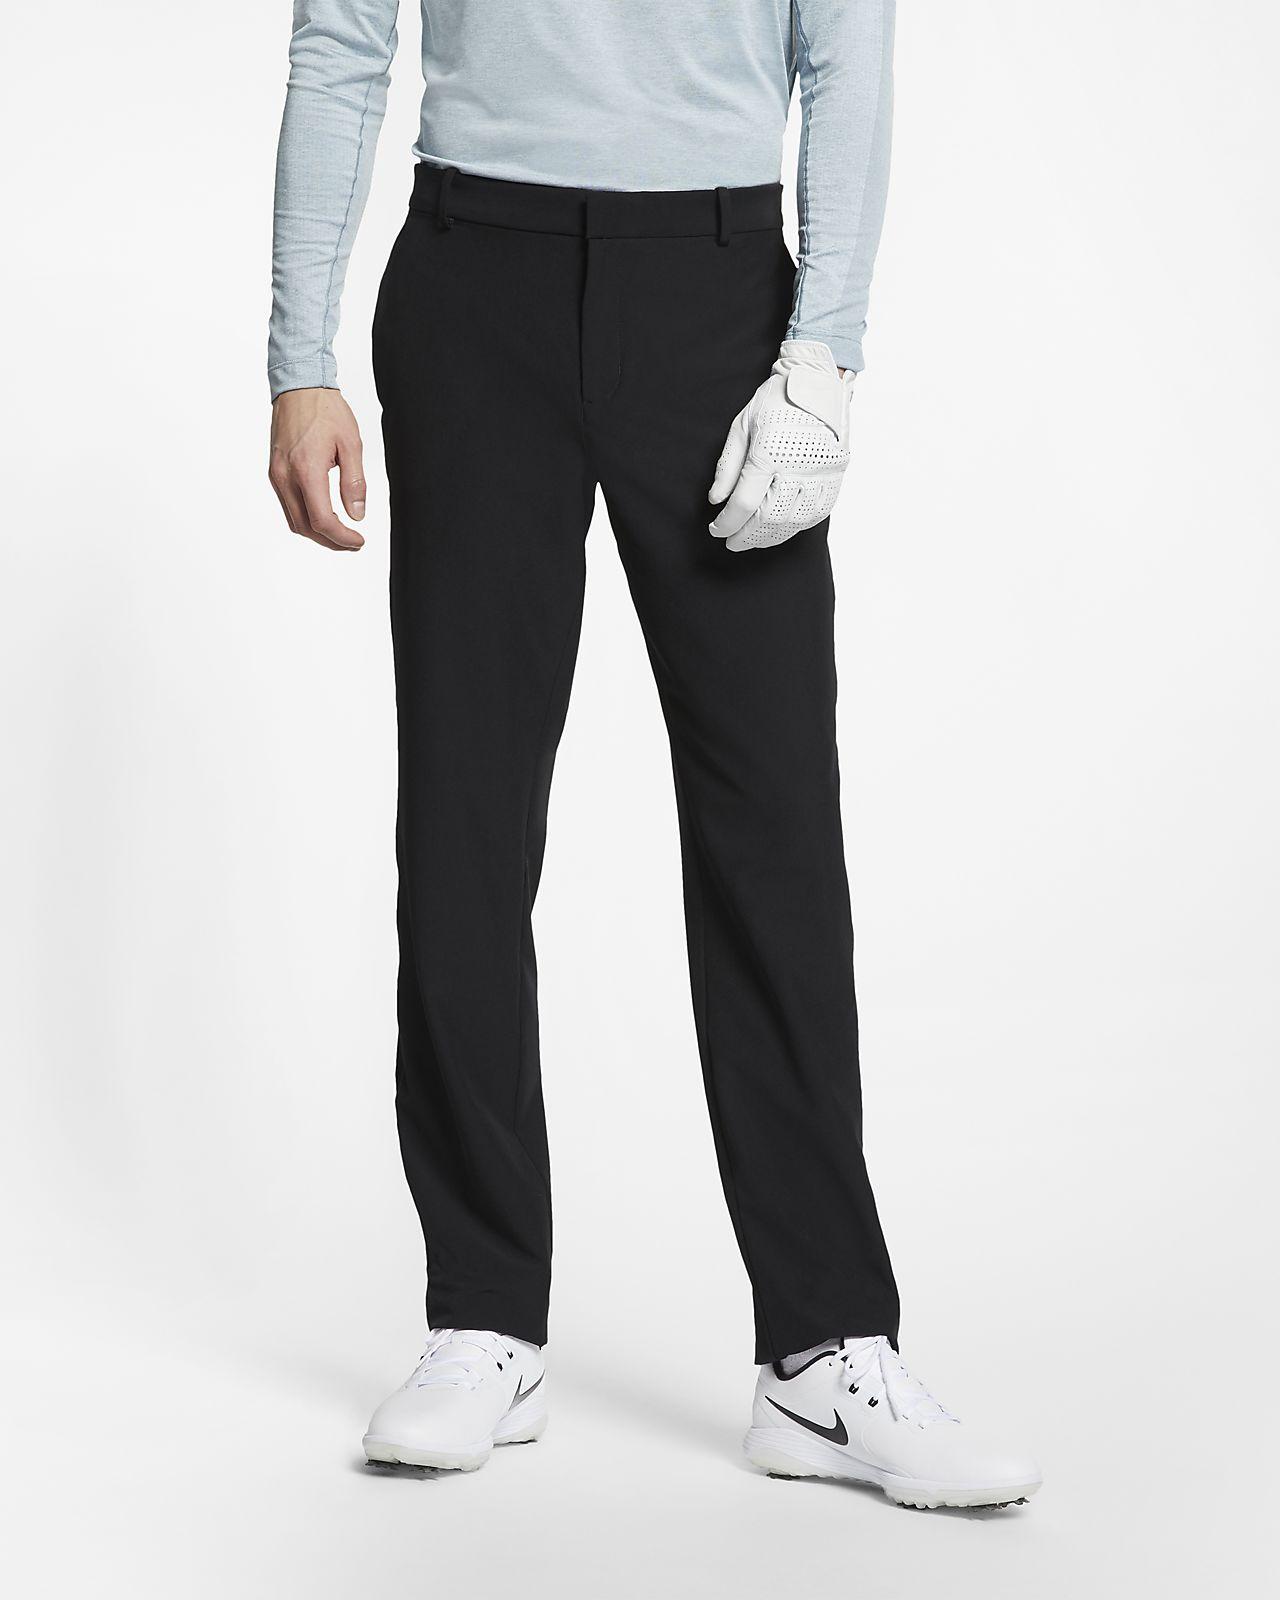 dd5a3313145c Nike Flex Men s Golf Pants. Nike.com